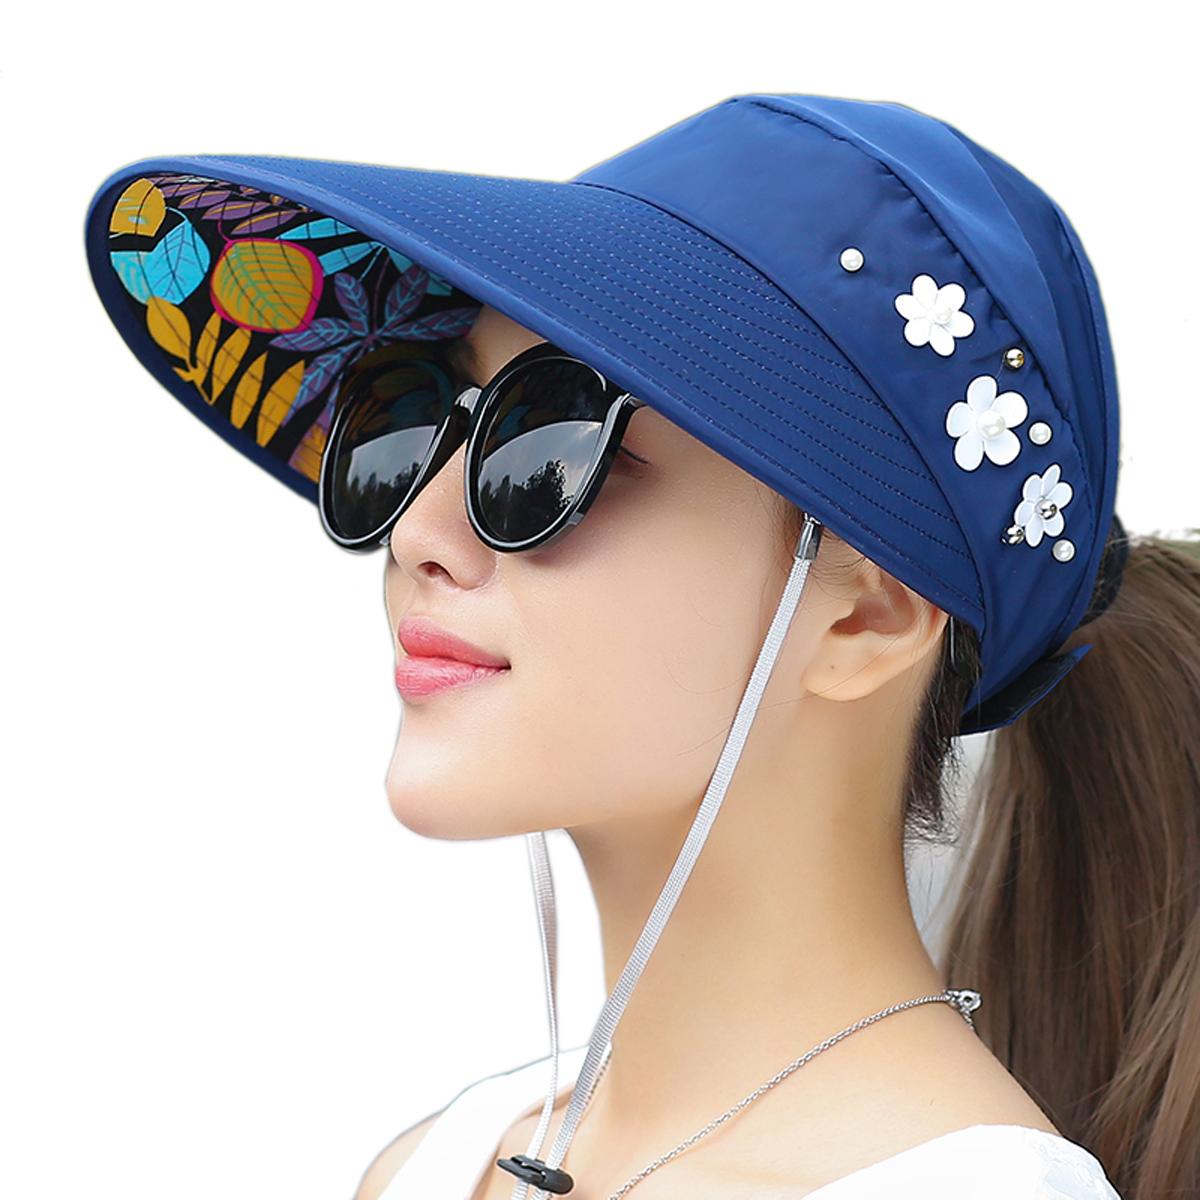 fe9977b8e0c Details about Women Lady Sun Hat Wide Brim UV Protection Summer Beach Visor  Cap